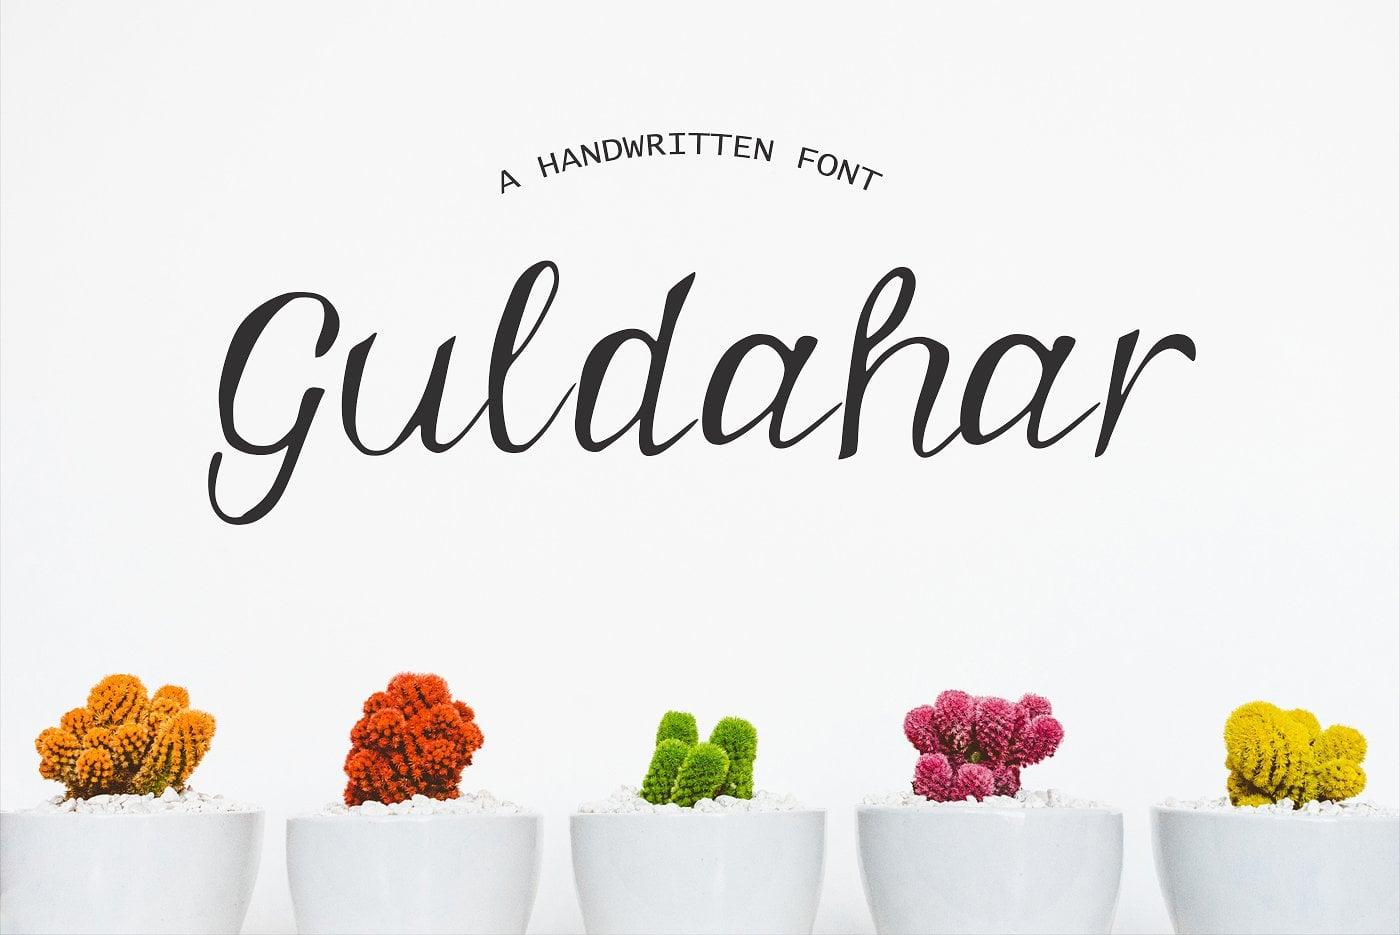 15 Creative Handmade Fonts - $19 ONLY - main image. 4